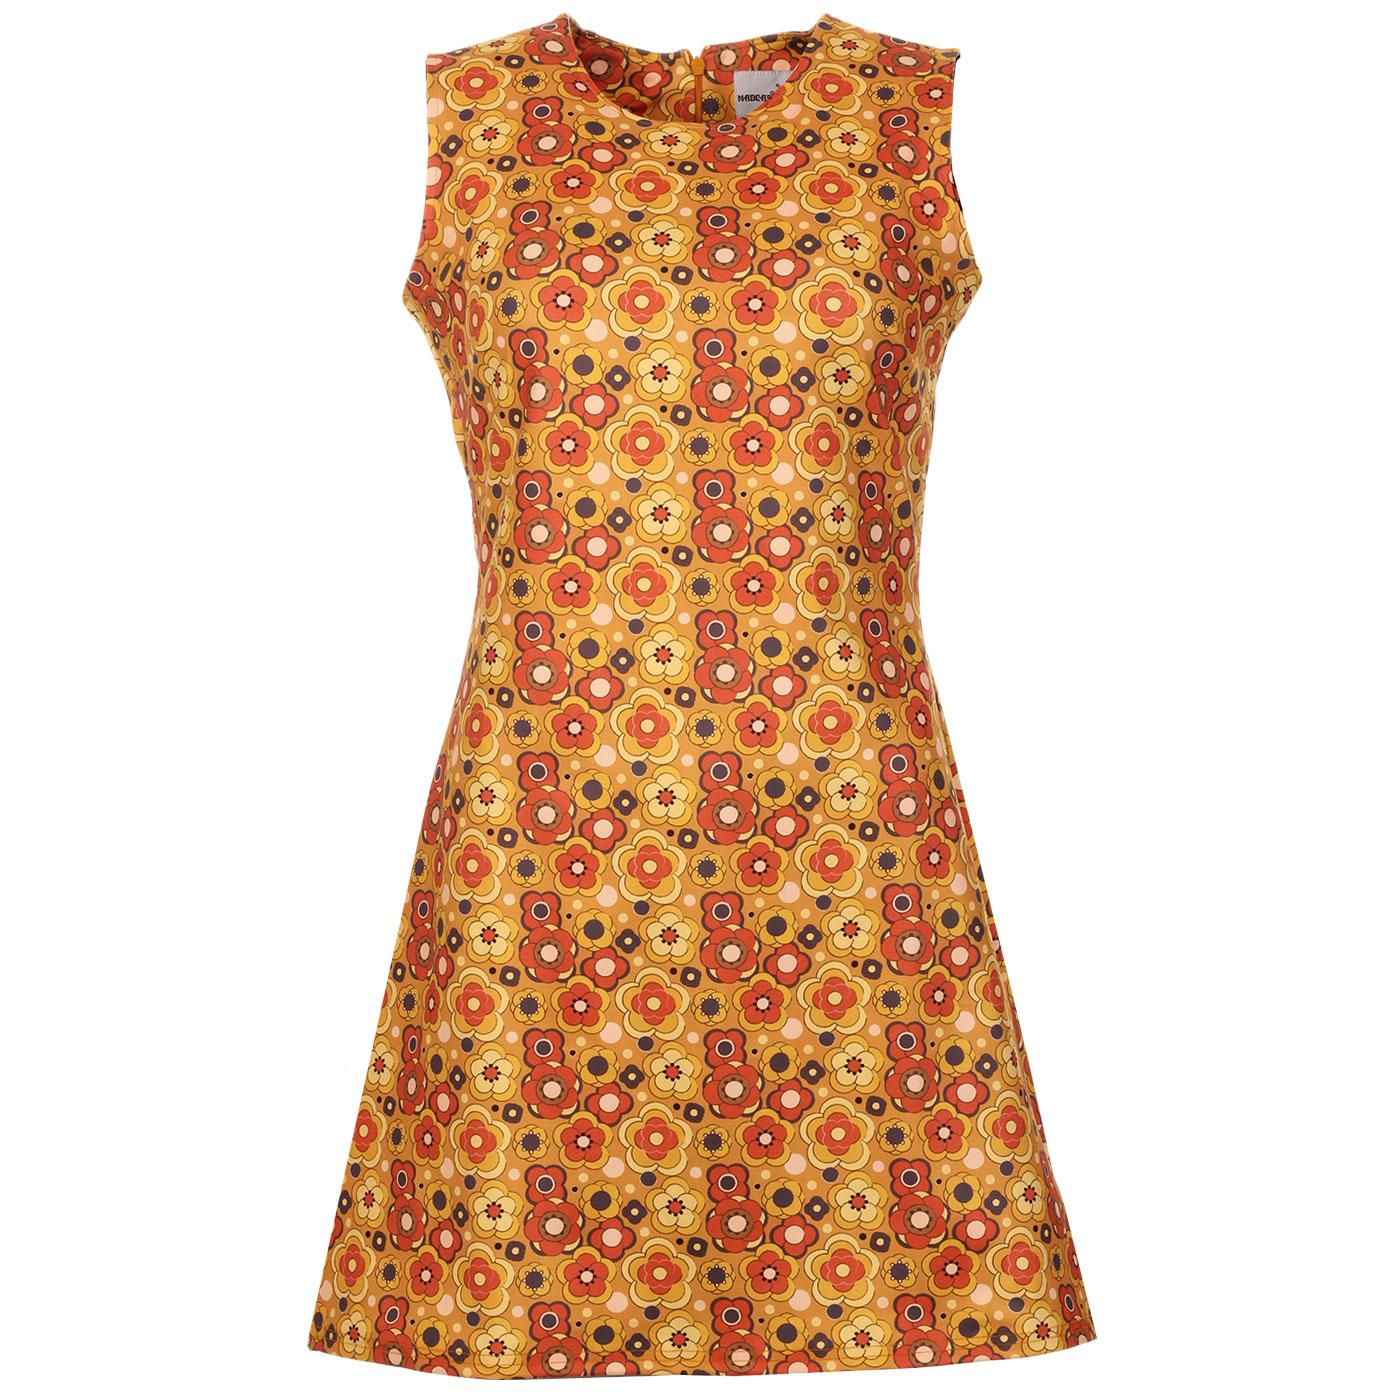 Madcap England Retro 60s Mod Yellow Floral Shift Dress